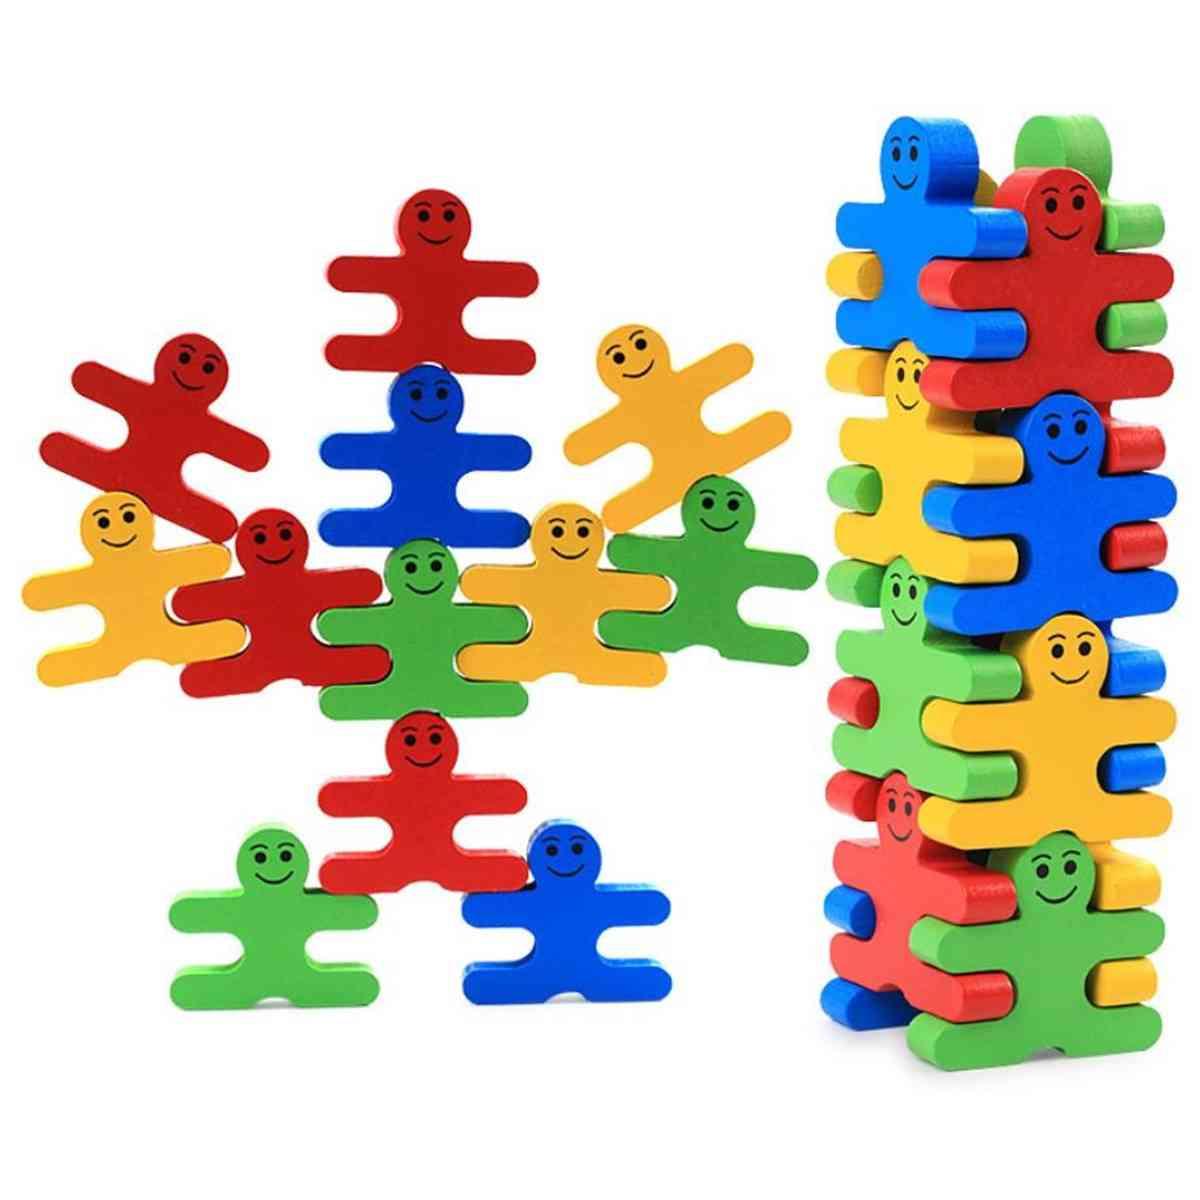 Small Cartoon Figure Style, Wooden Ballance Building Block Toy